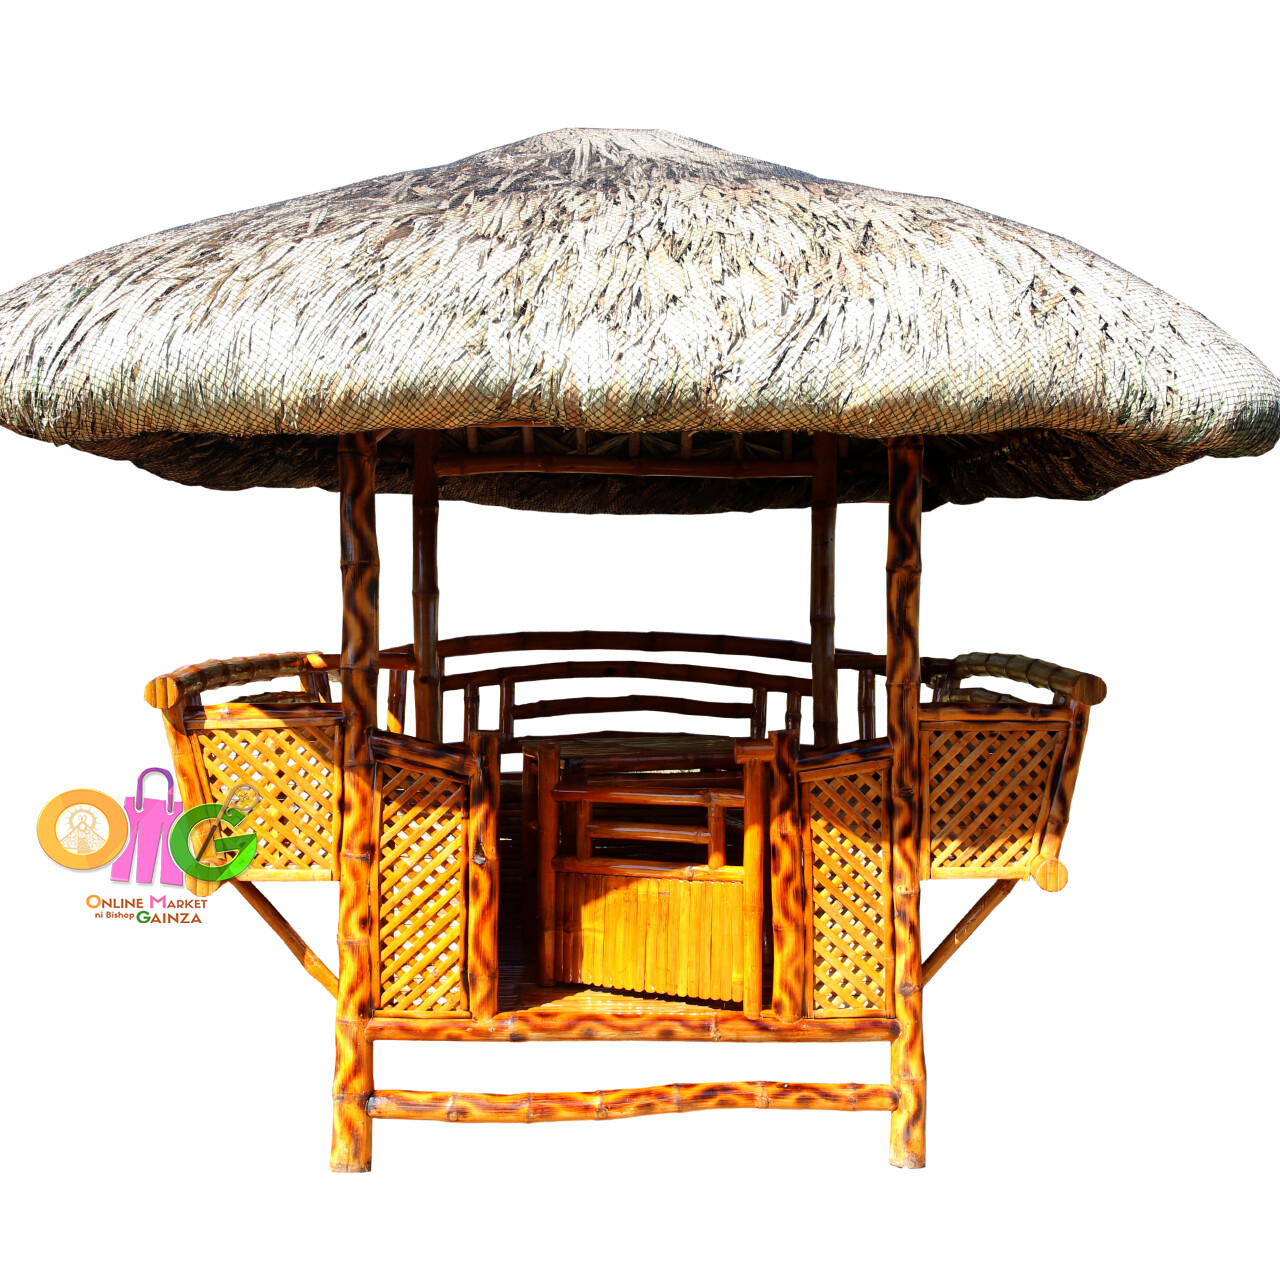 Sir Zaldy Furniture - Bahay Kubo (Open)